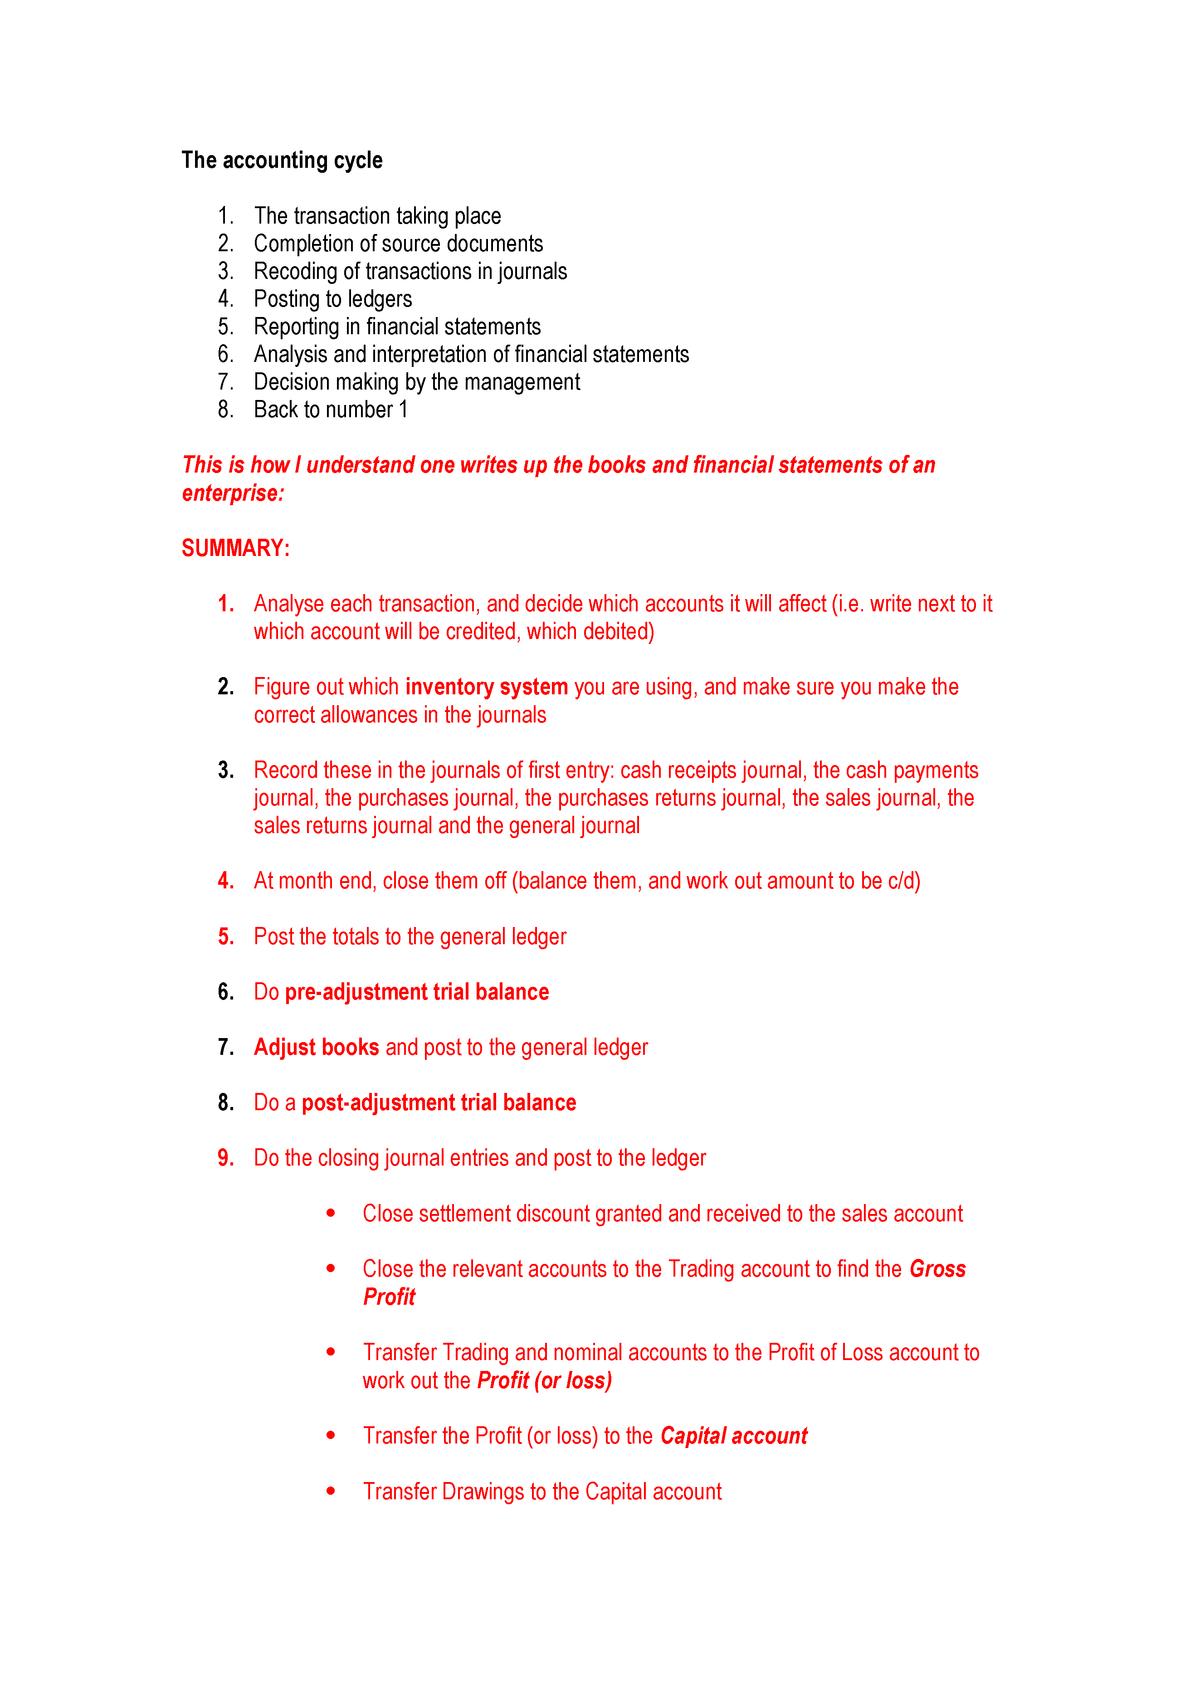 FAC1502 The accounting cycle exam - FAC1502: Financial